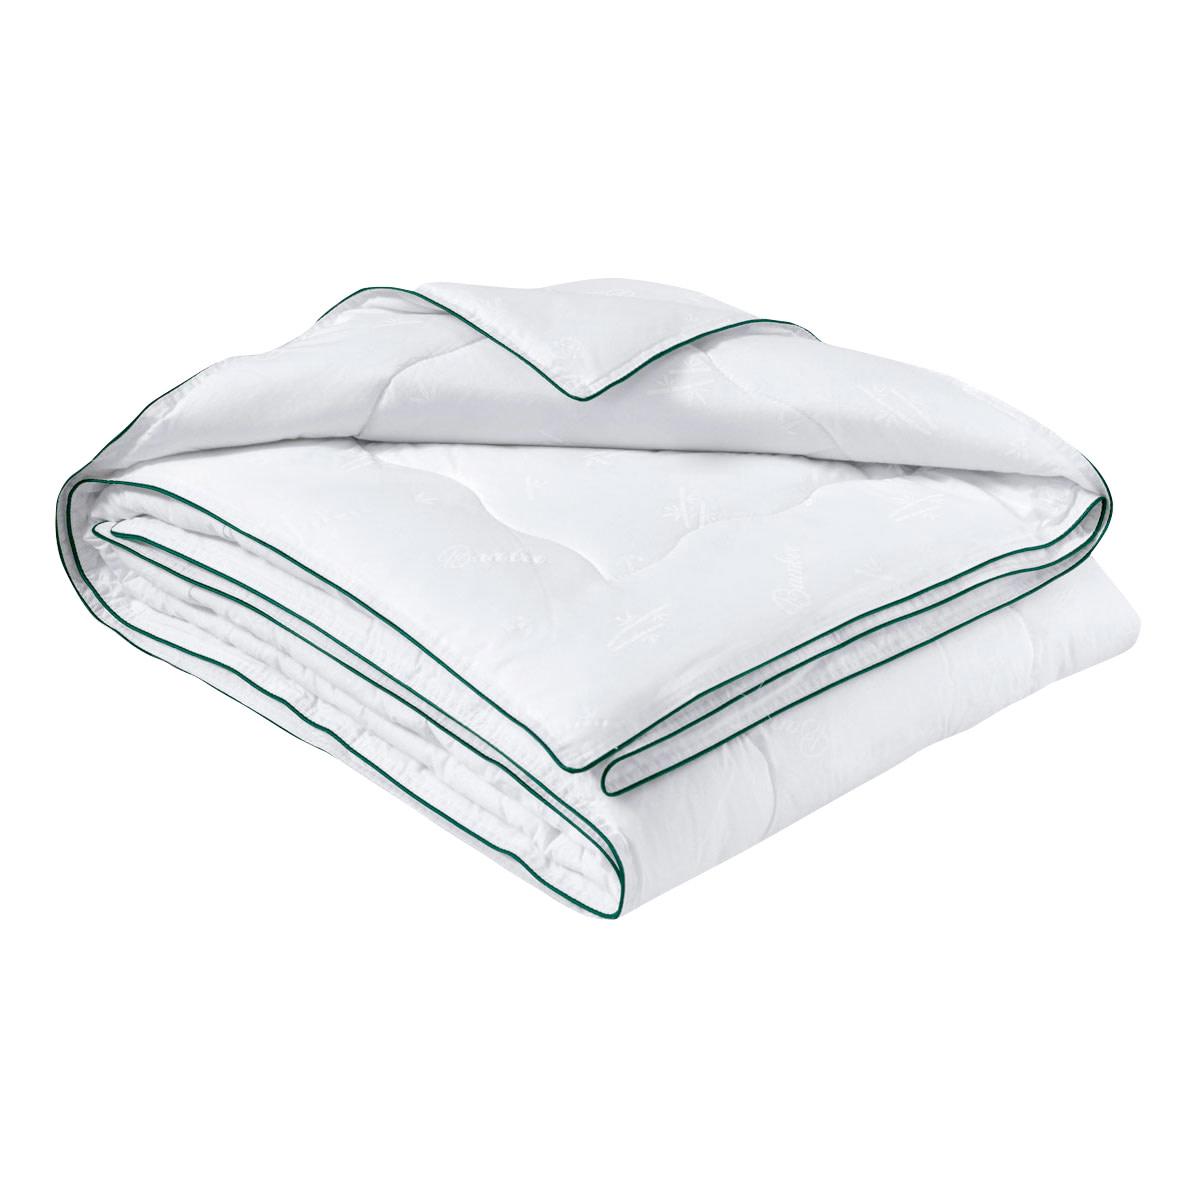 Одеяло Arya home collection 145х95 см бамбук нано волокно